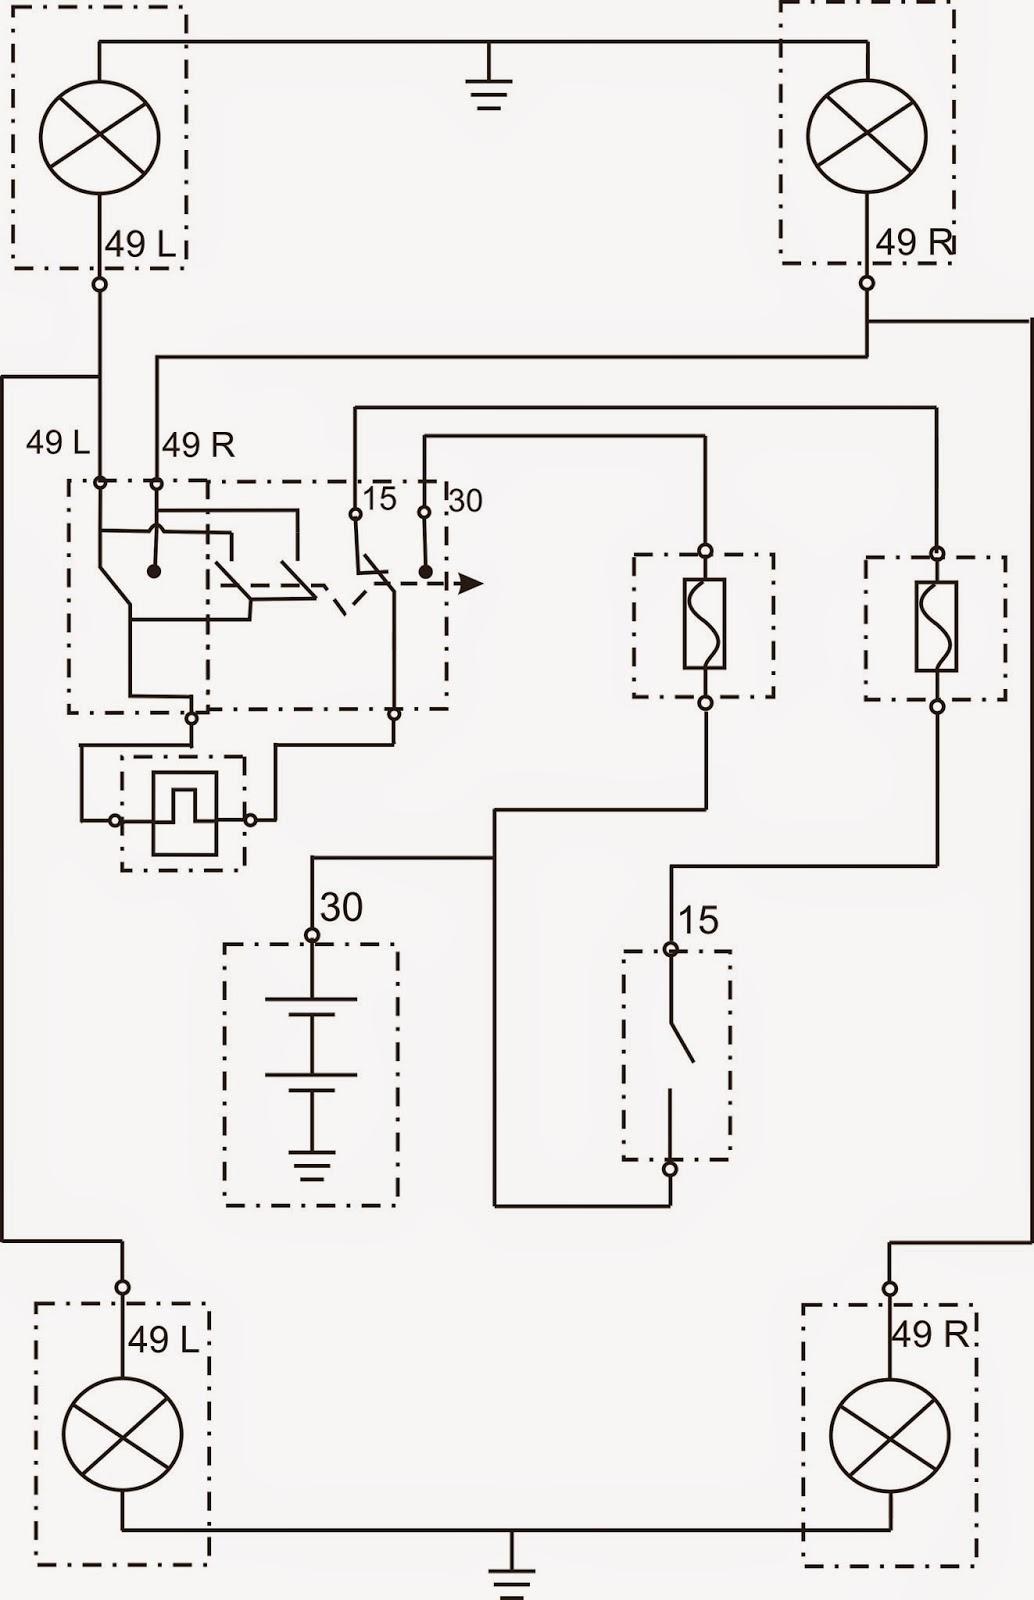 L  Wiring Diagram Australia besides Wiring Diagram For Baldor Electric Motor in addition Wiring Diagram Rangkaian L u Kepala also Bodine Electric Gear Motor Diagram Wiring Diagrams further Motor Wiring Diagram. on bodine dc motor wiring diagram